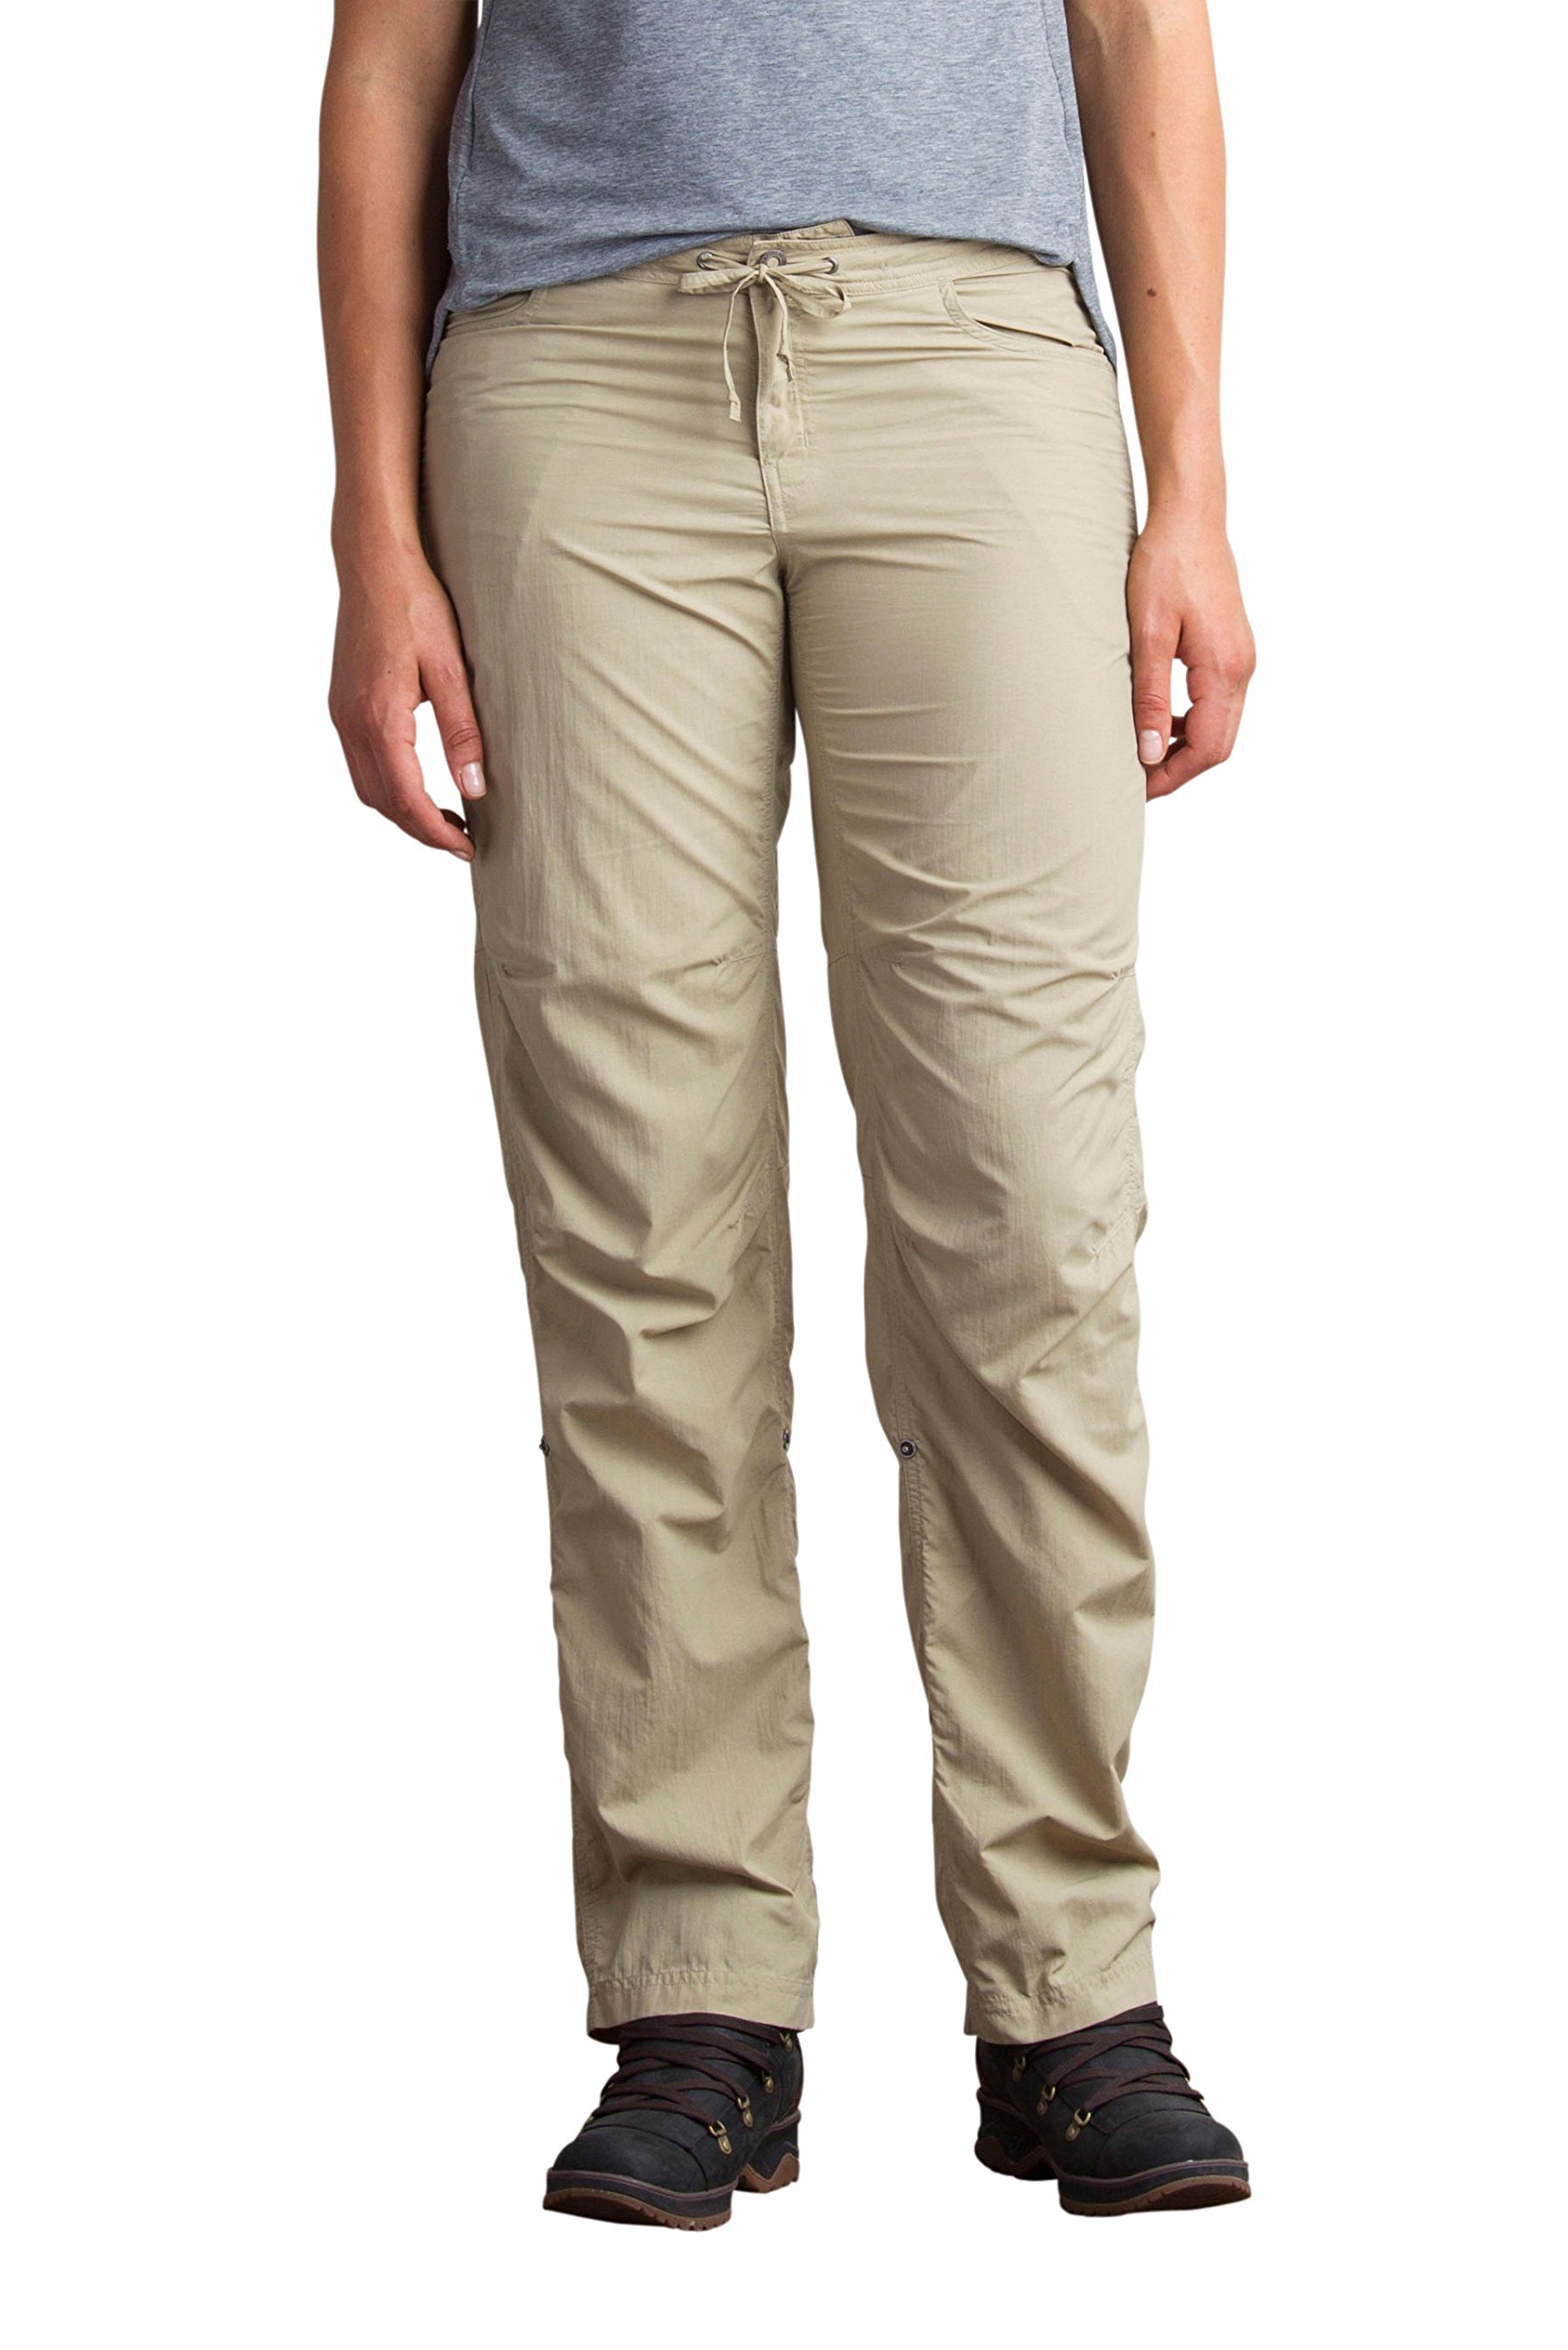 ExOfficio Women's BugsAway Damselfly Pants Petite Length, Tawny, 4